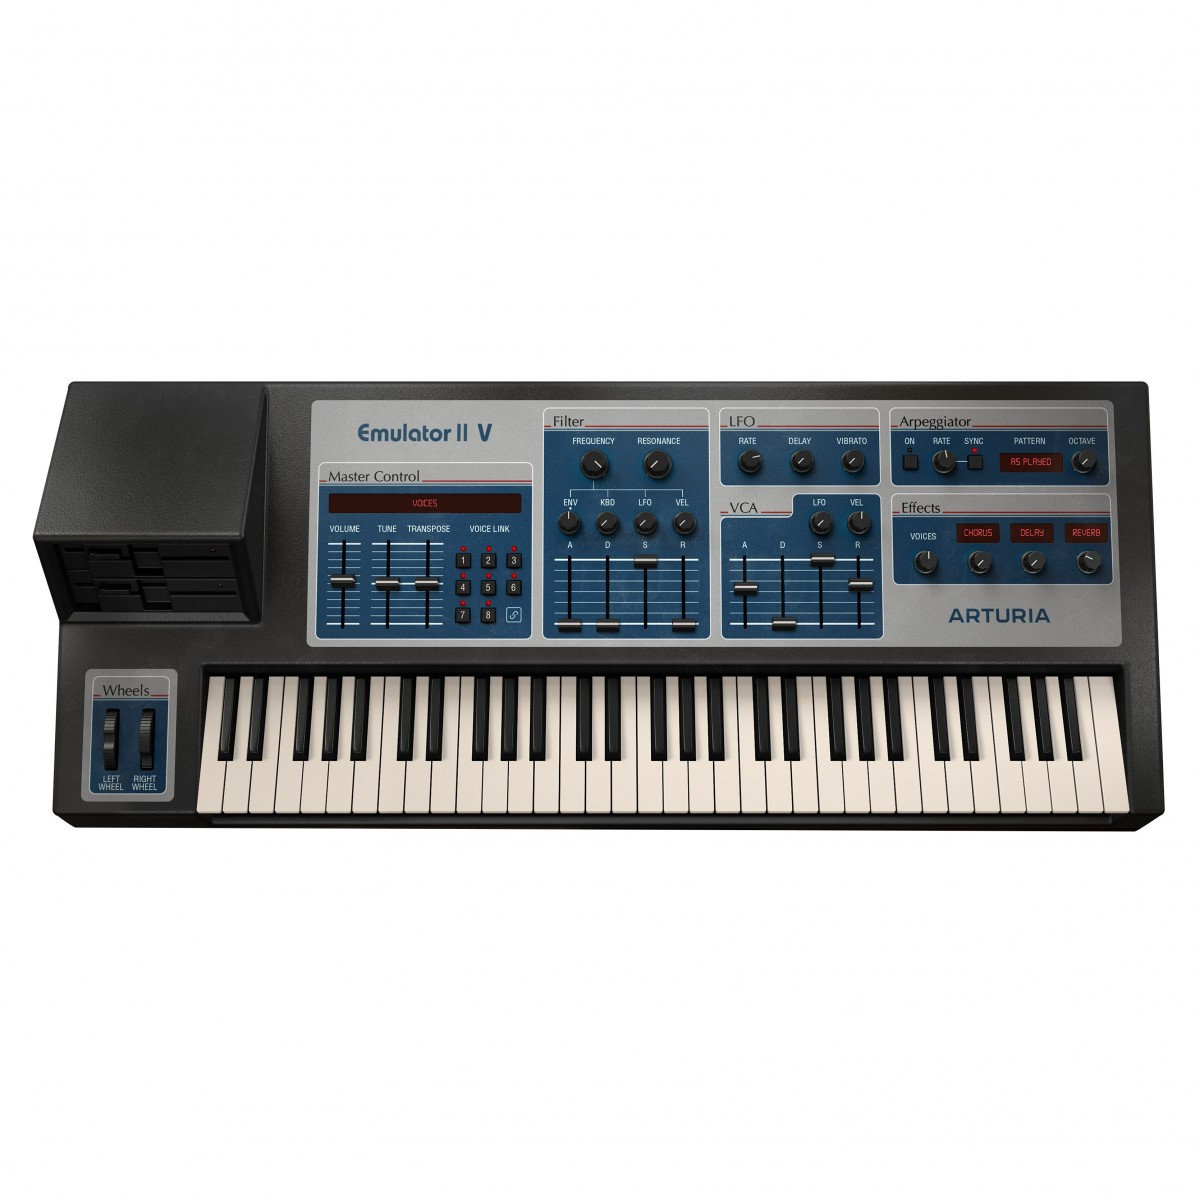 Emulator II V